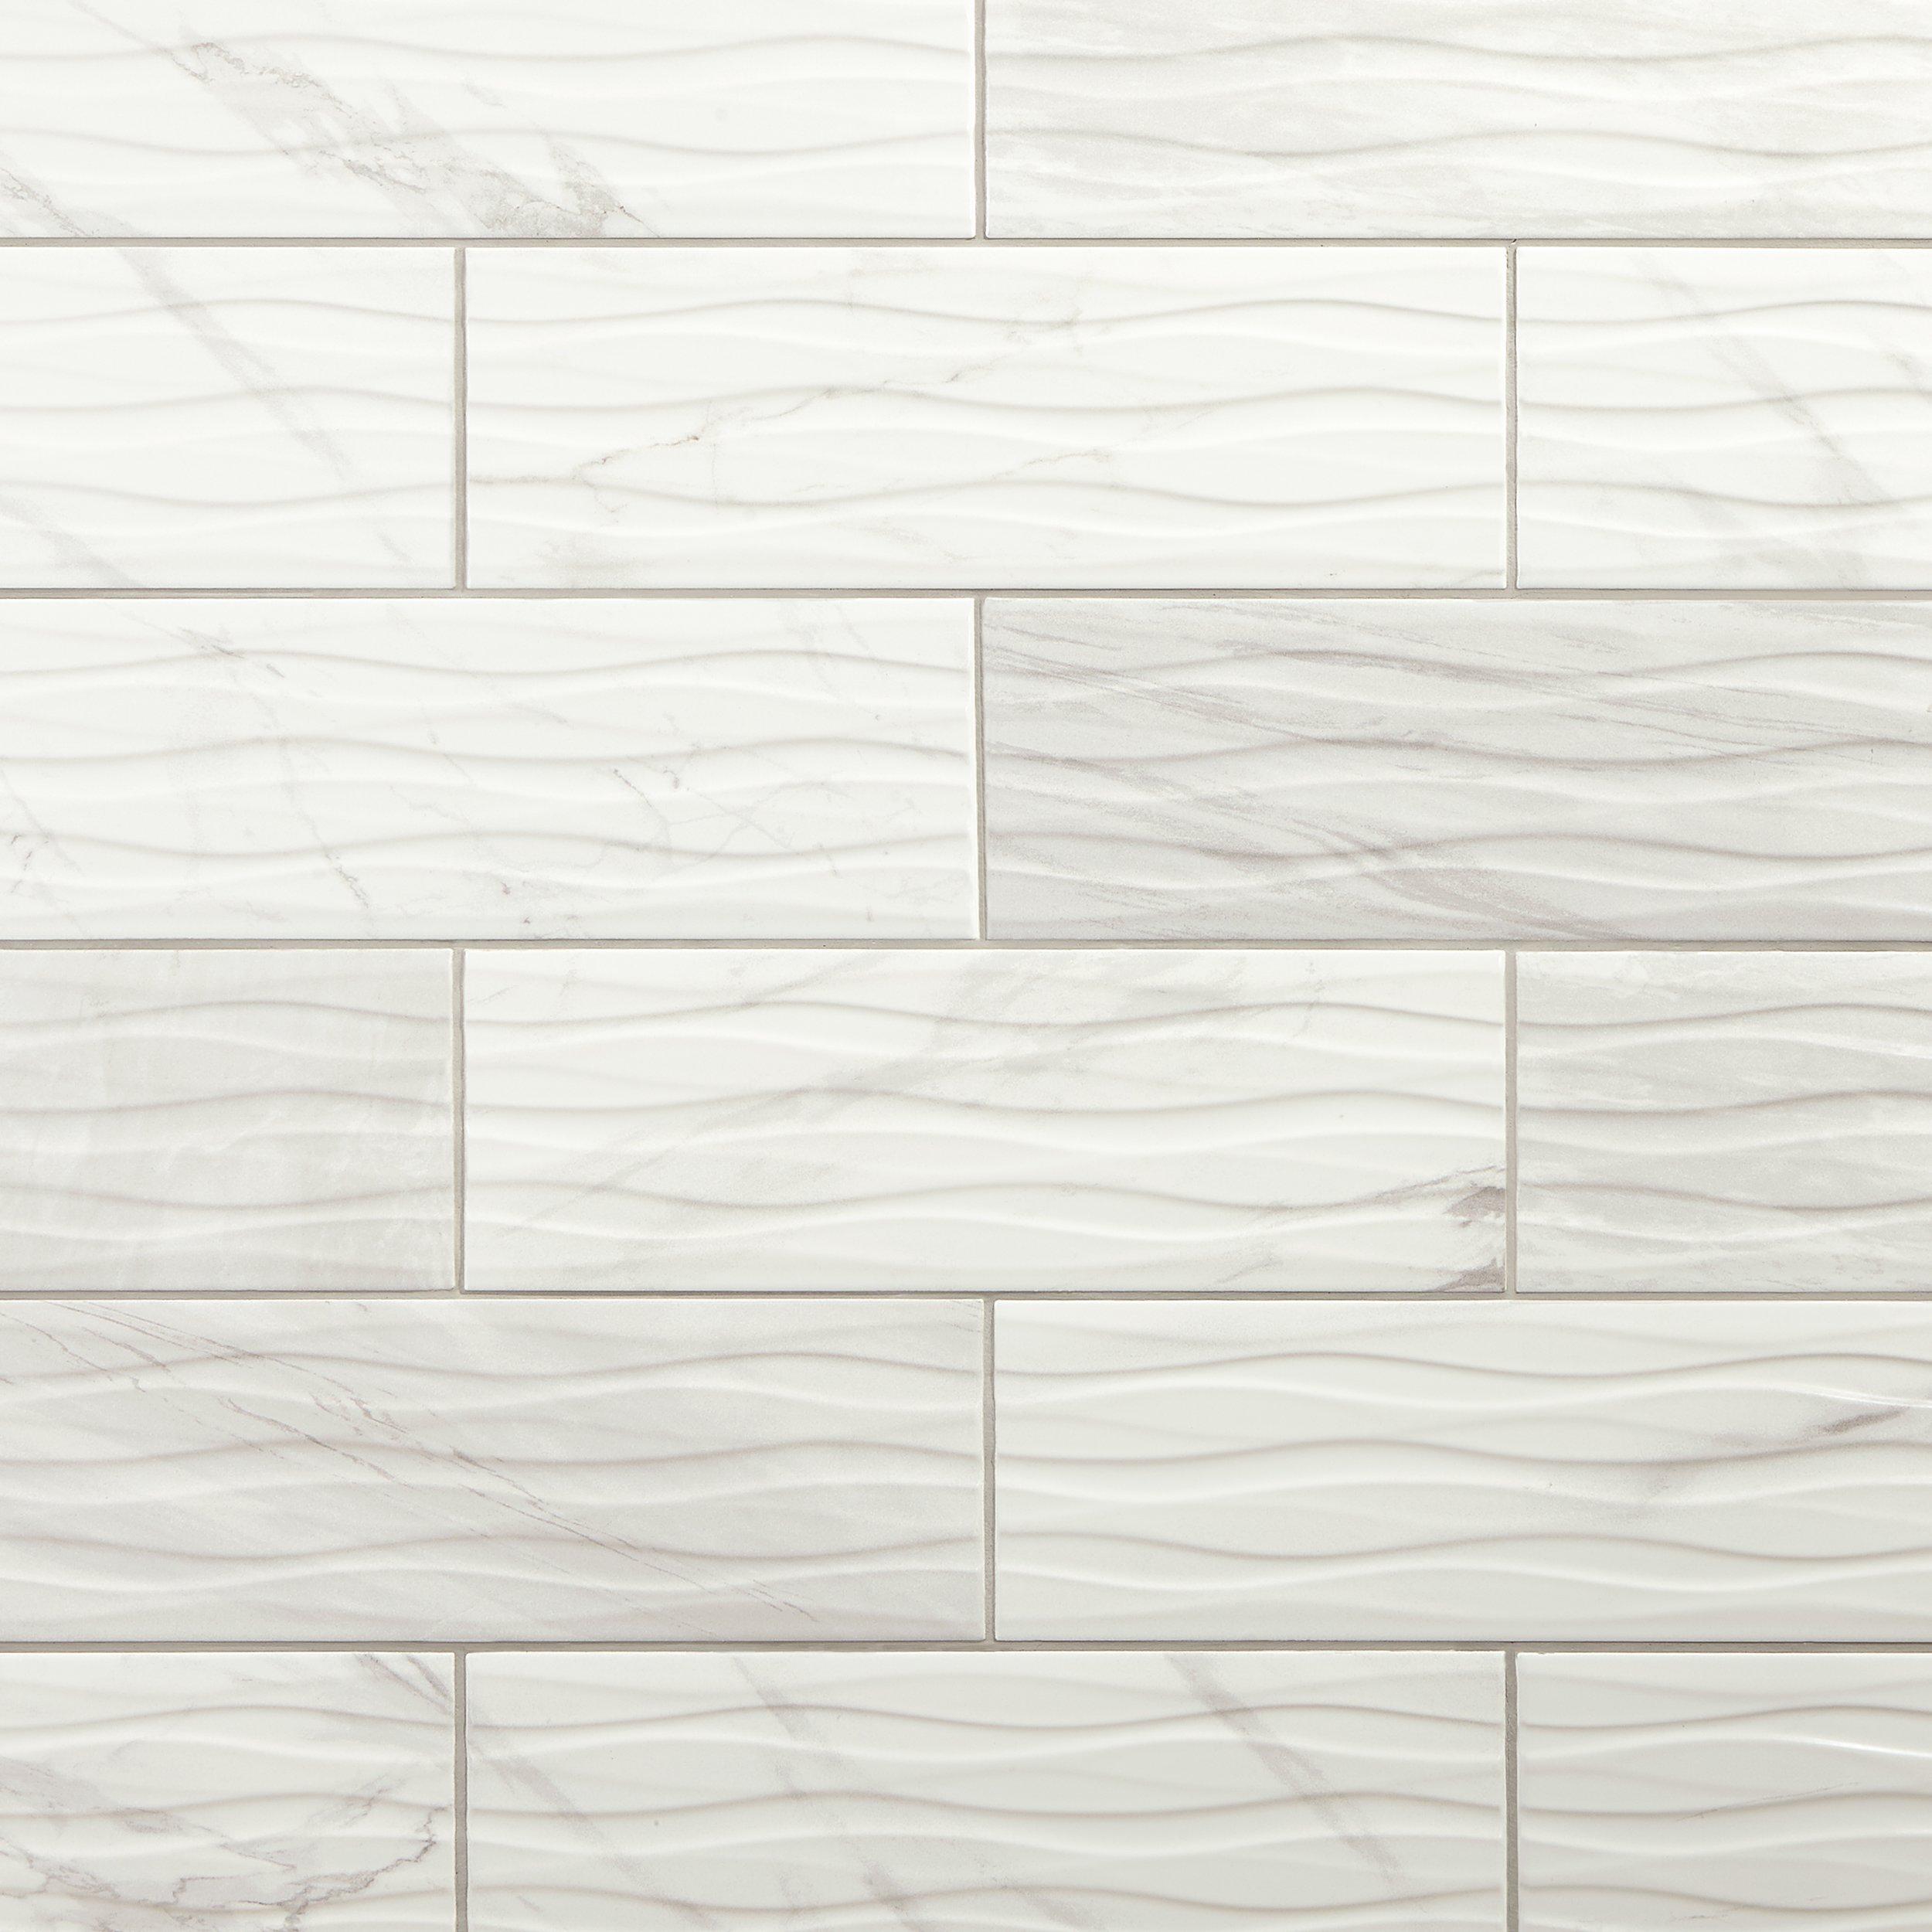 Marble Look Tile Floor Decor